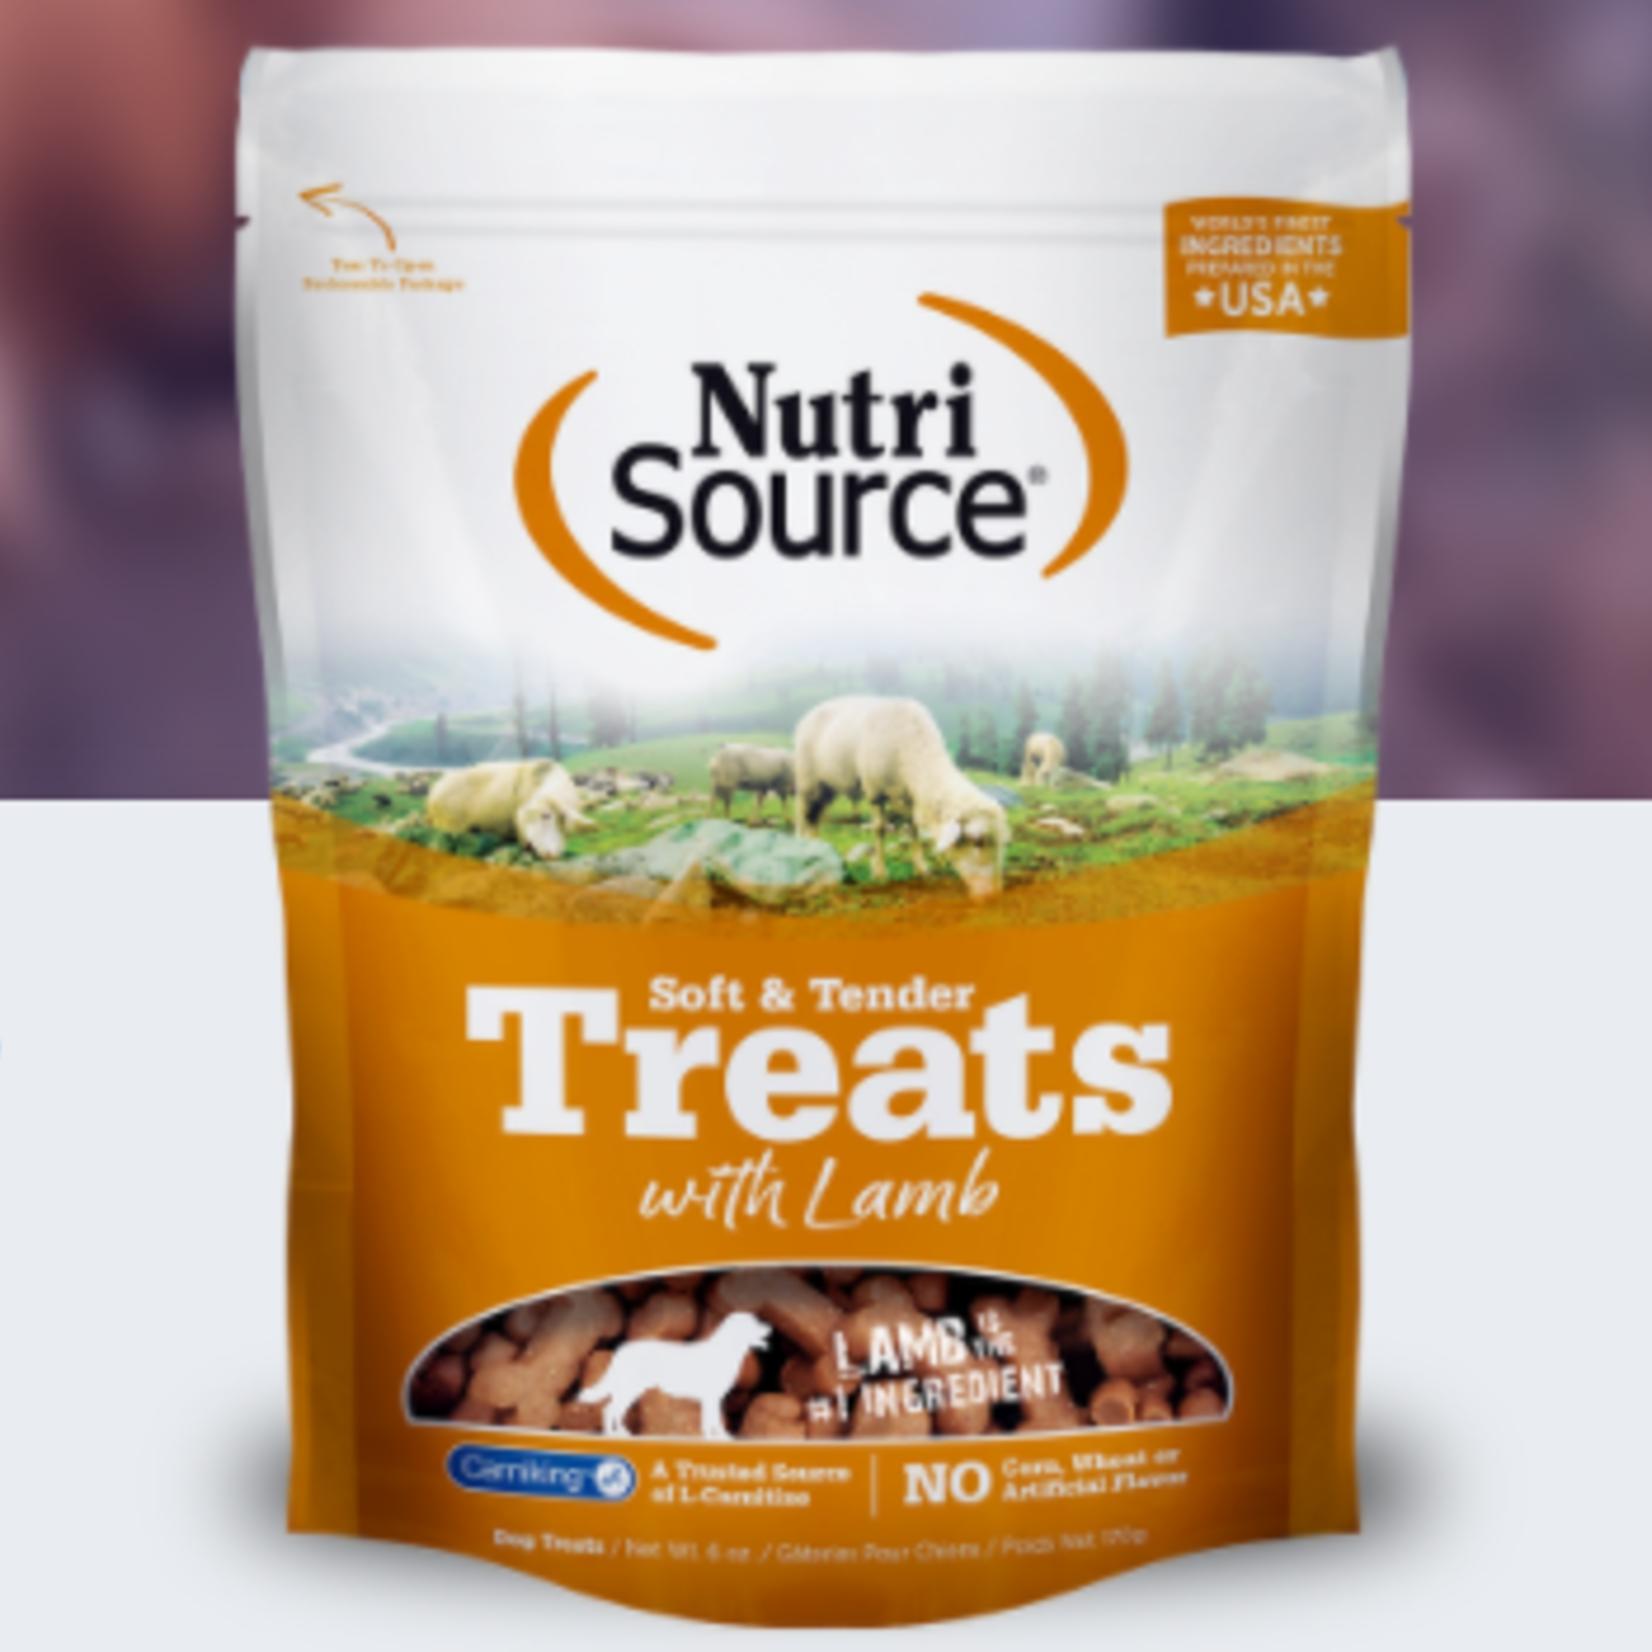 Nutri-Source With Lamb-Soft & Tender Treats - 6 oz